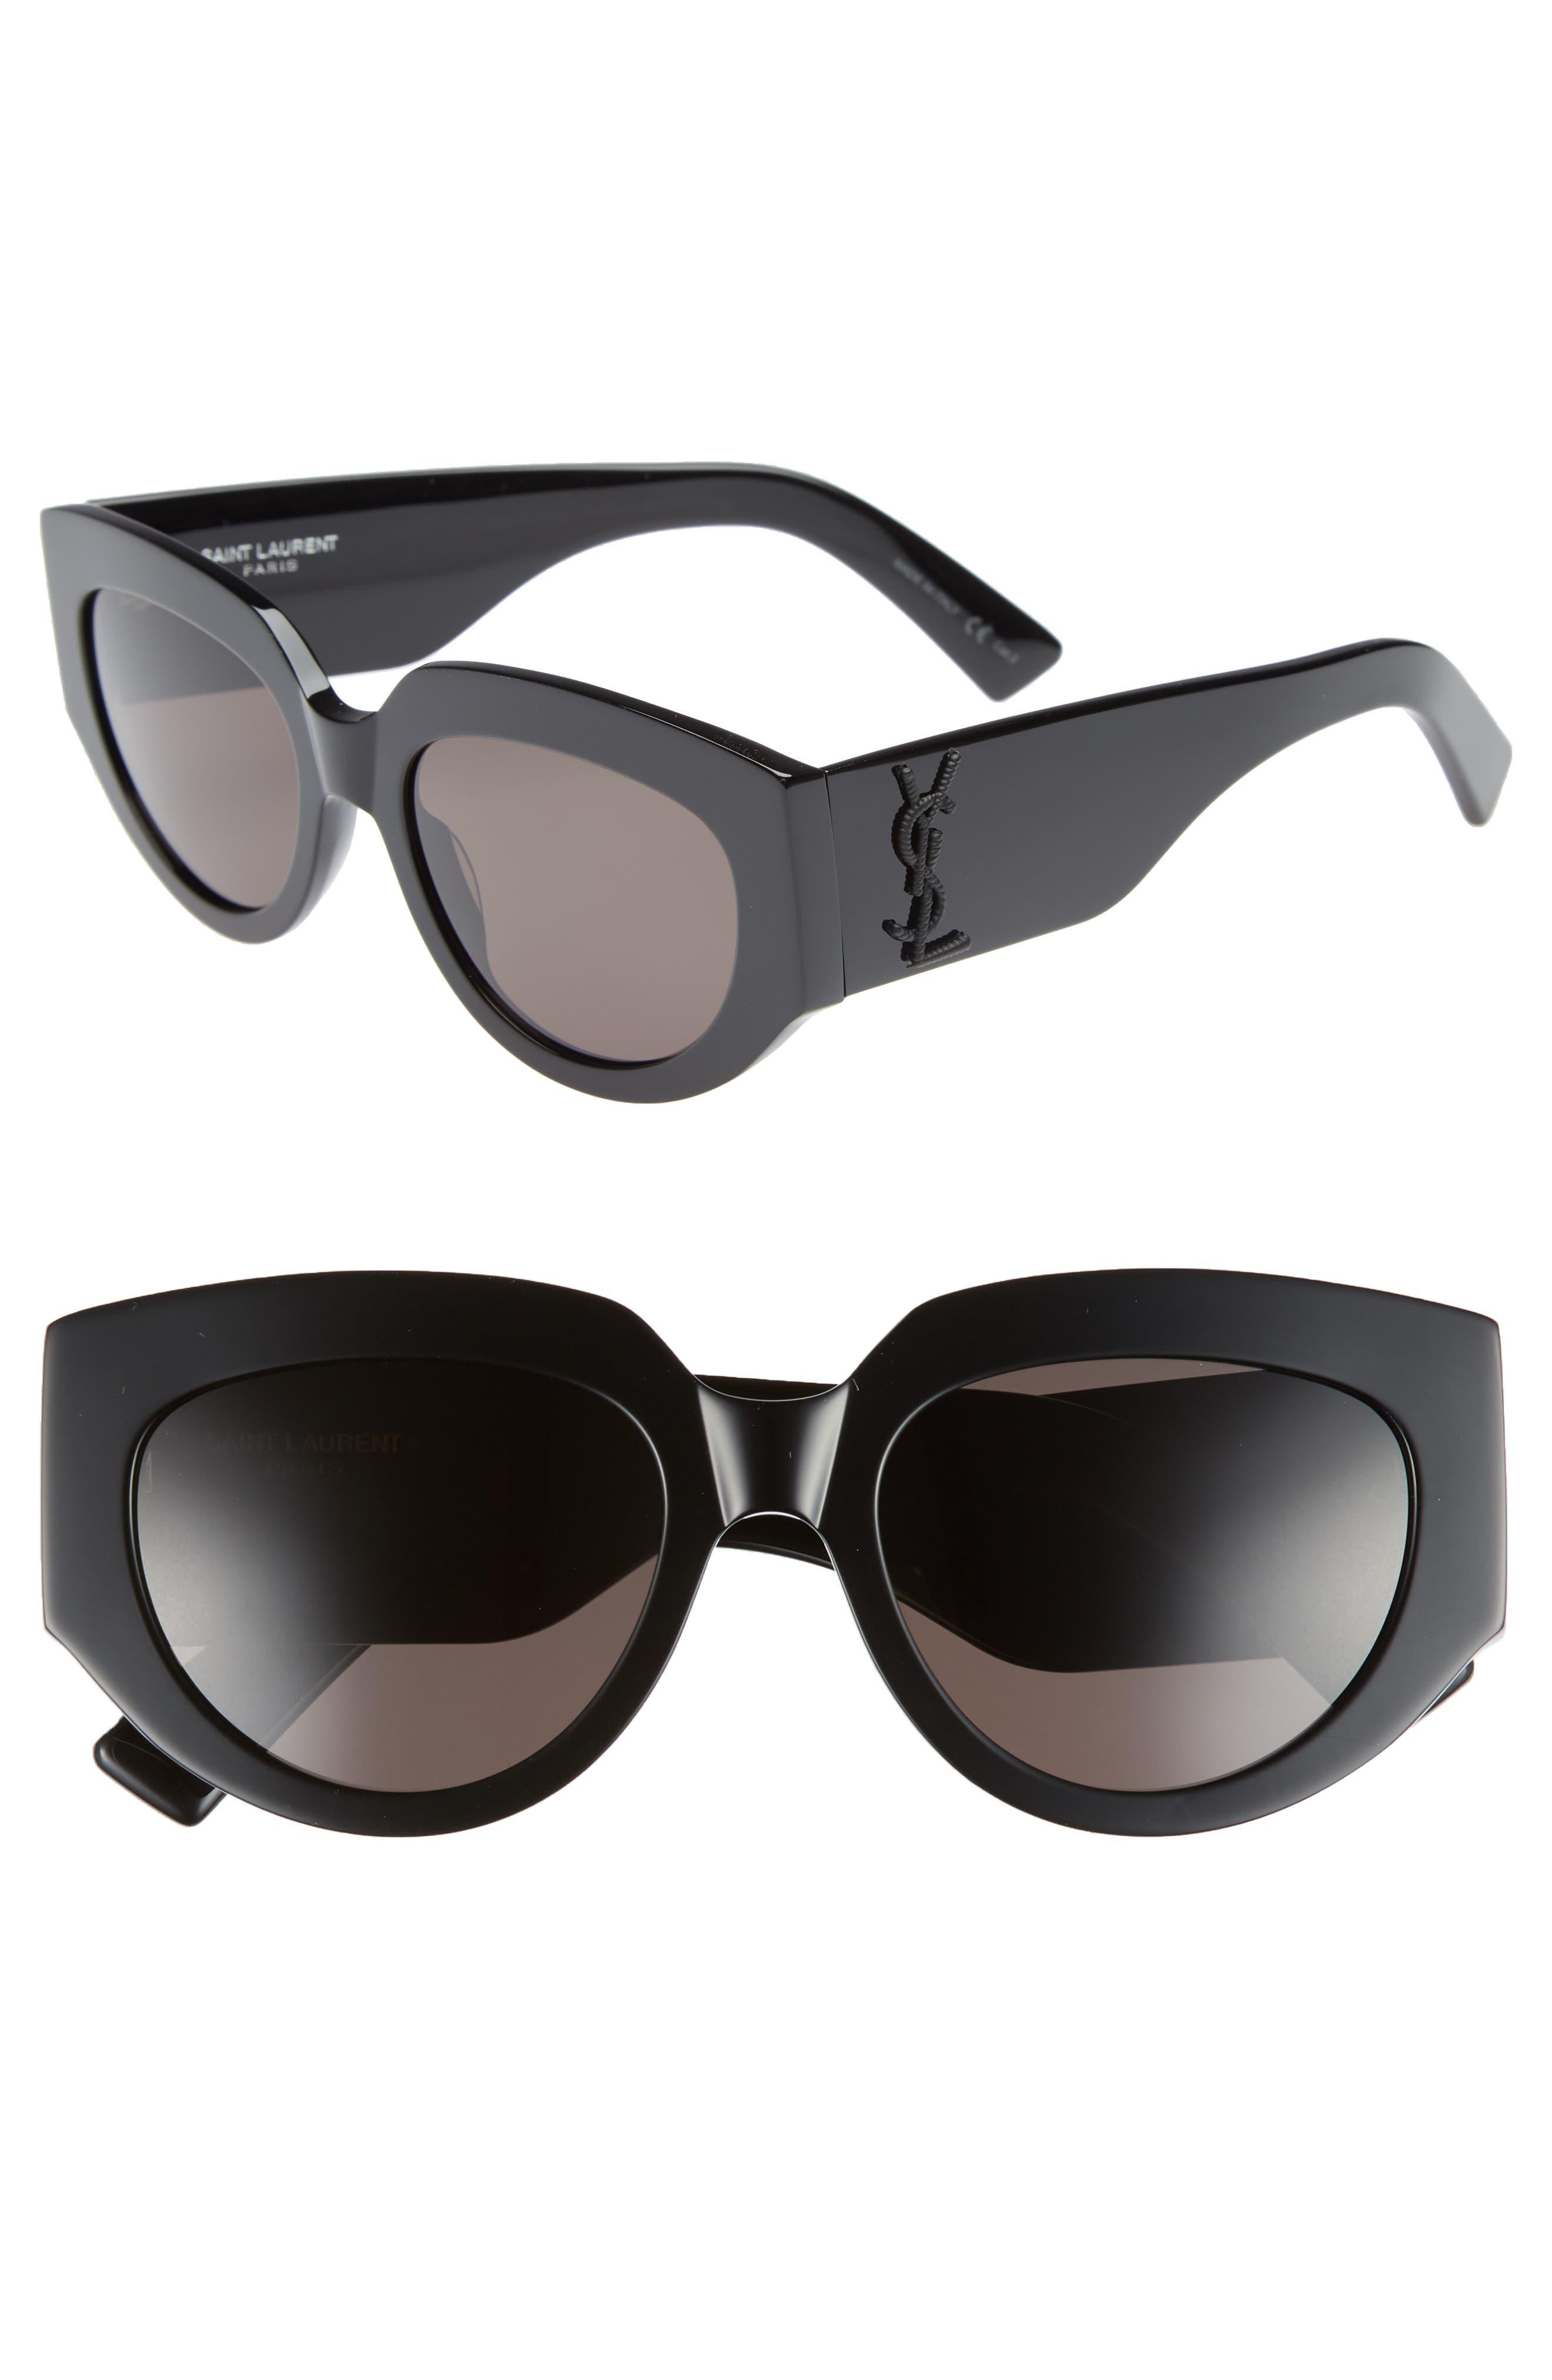 Rope 54mm Cat Eye Sunglasses,                             Main thumbnail 1, color,                             Black/ Black